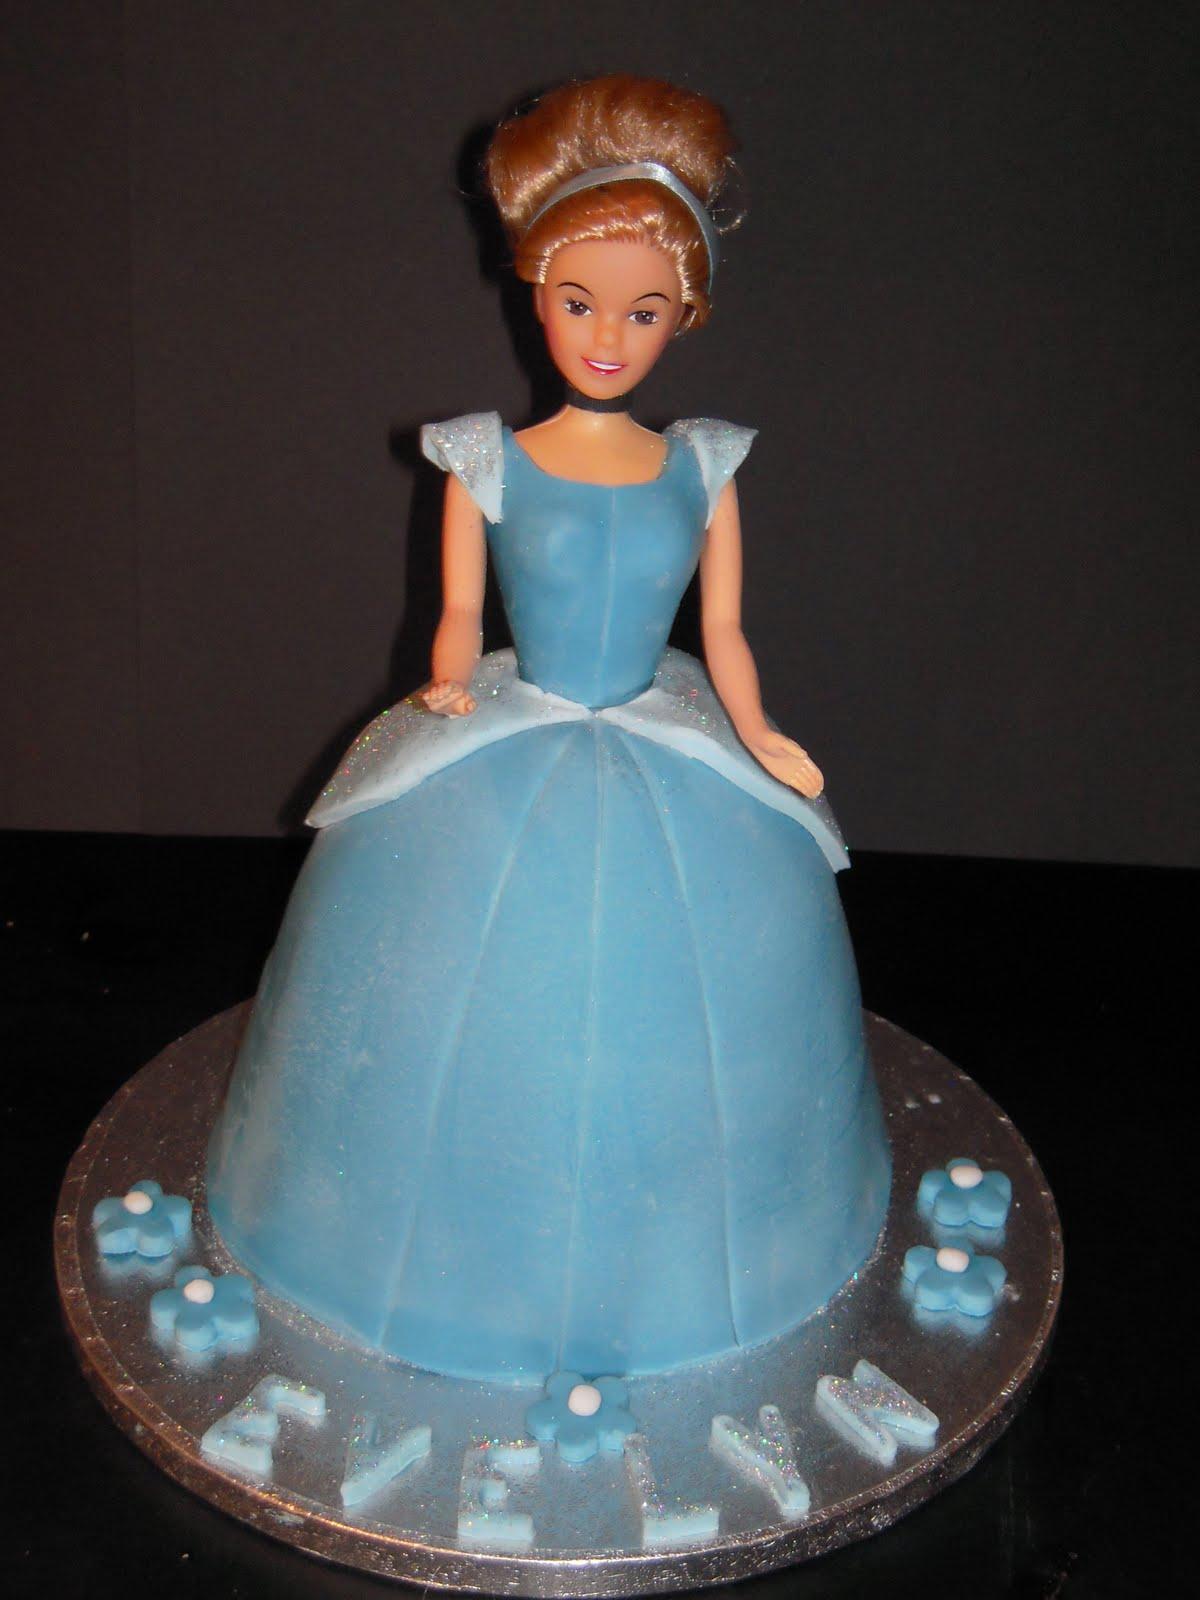 Eileen Atkinson S Celebration Cakes September 2011